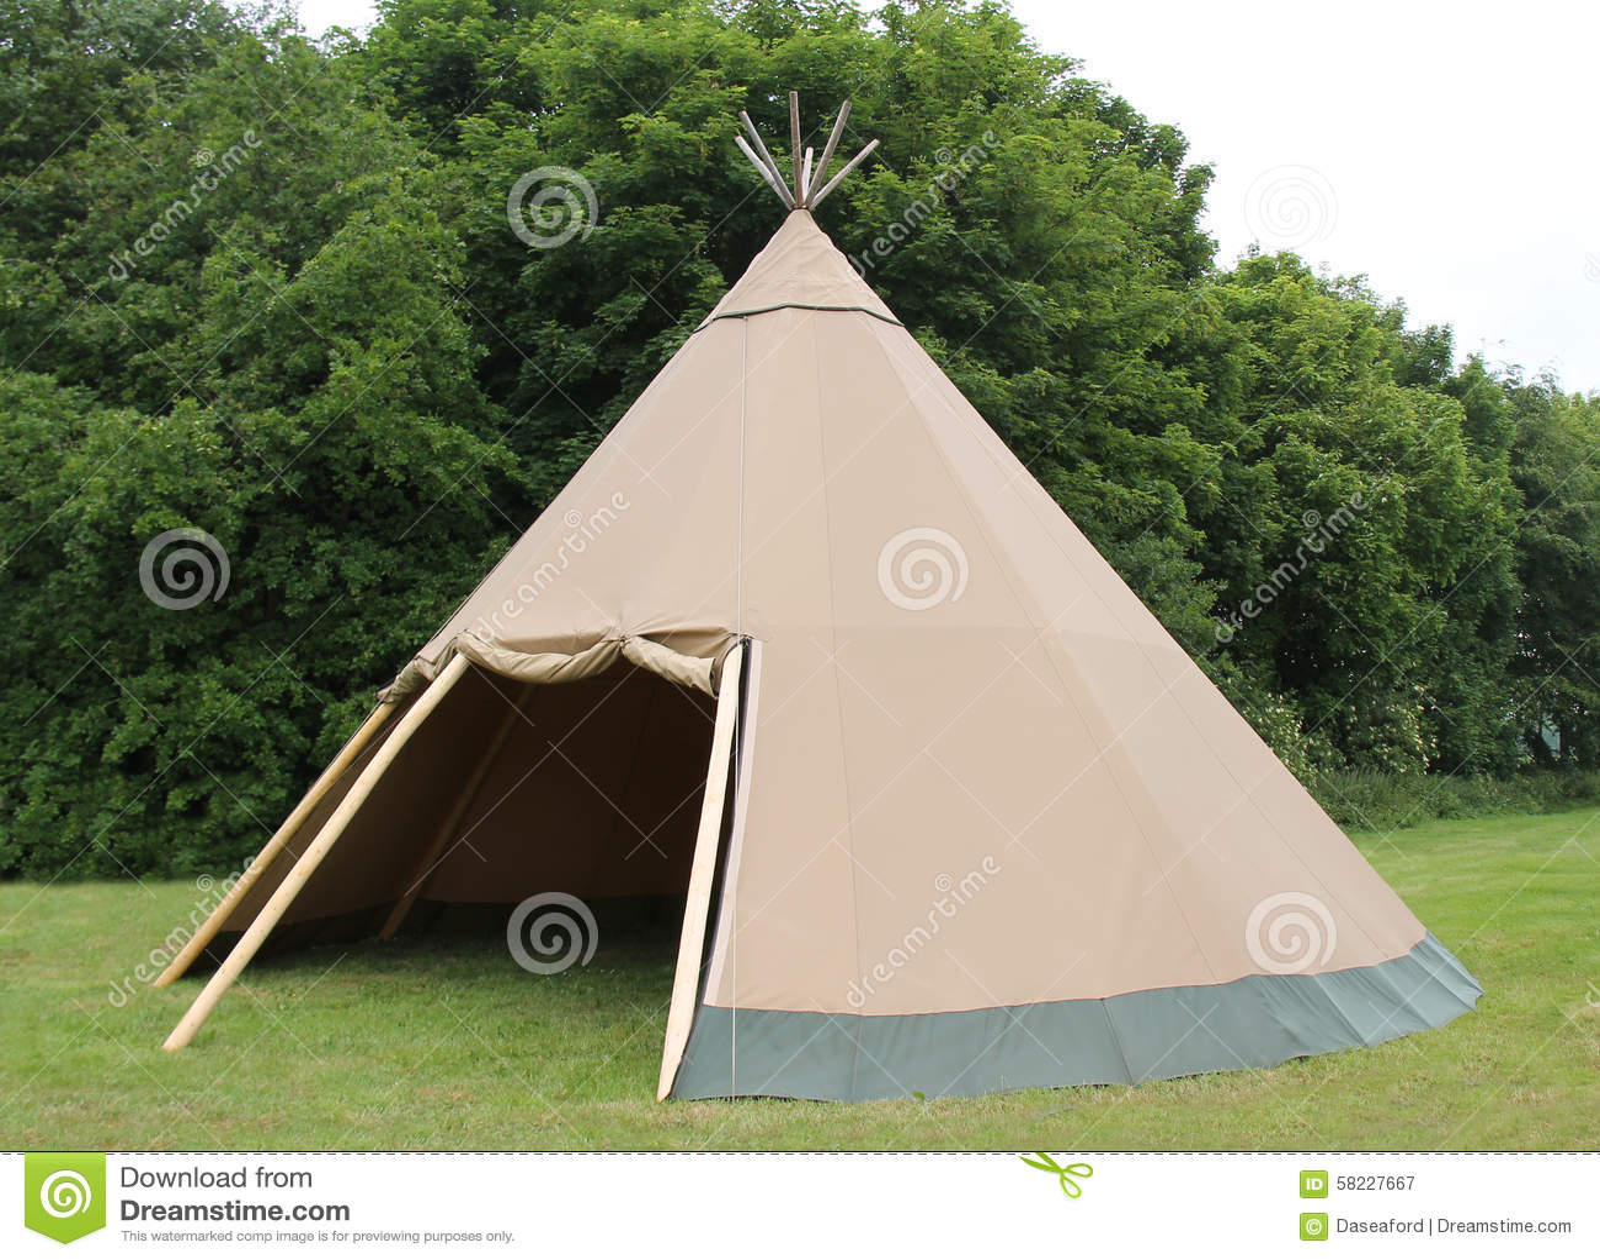 Wig Wam Tent 78